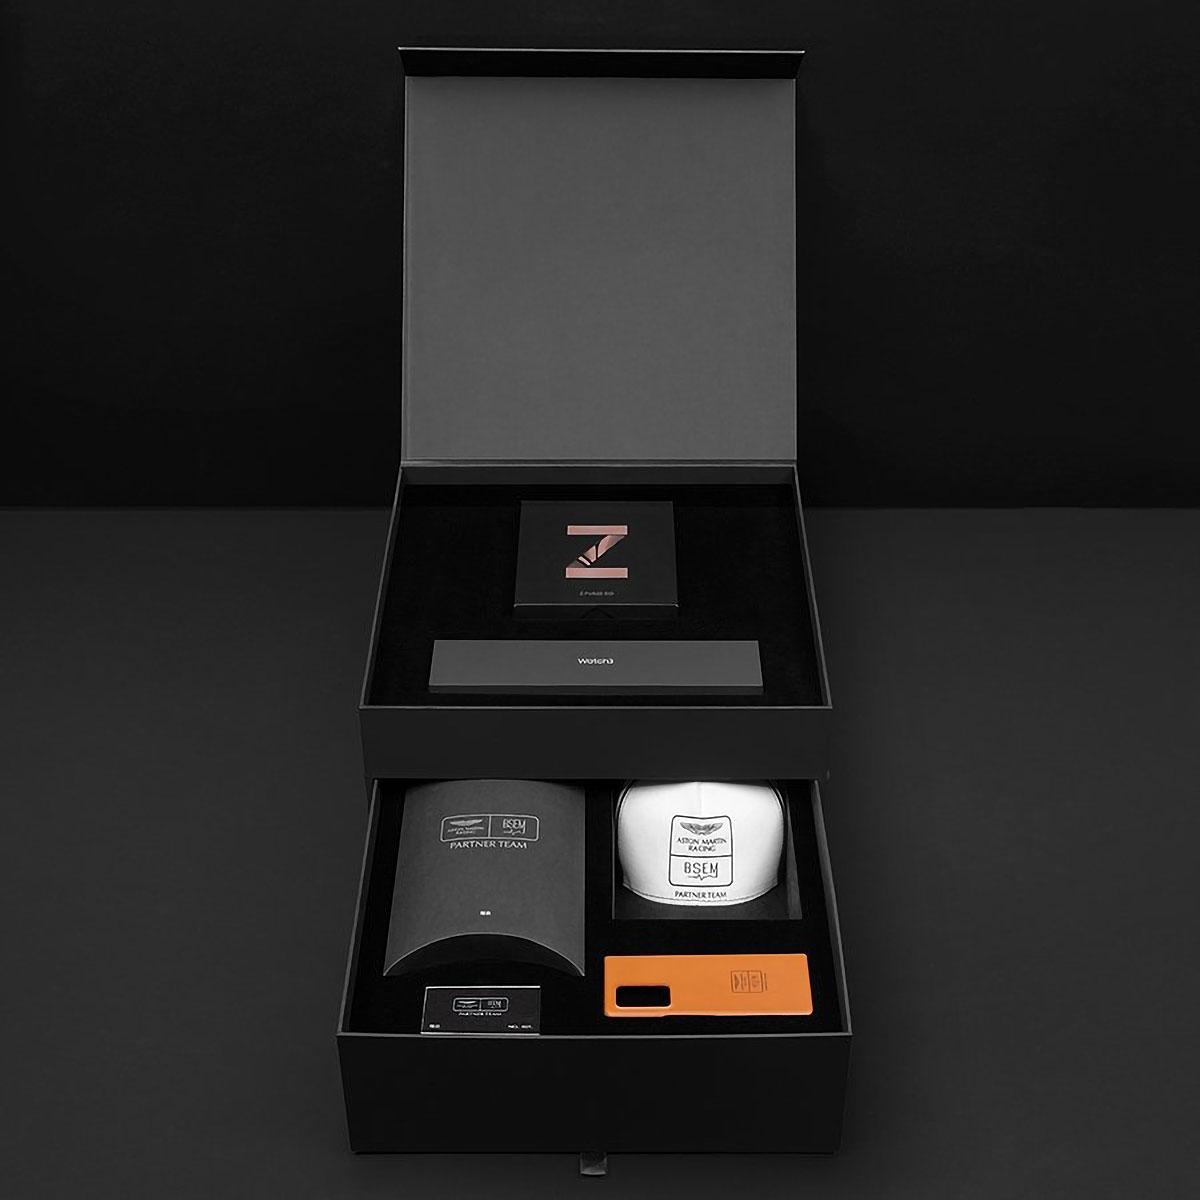 Samsung Galaxy Z Fold2 Aston Martin Racing Box Set